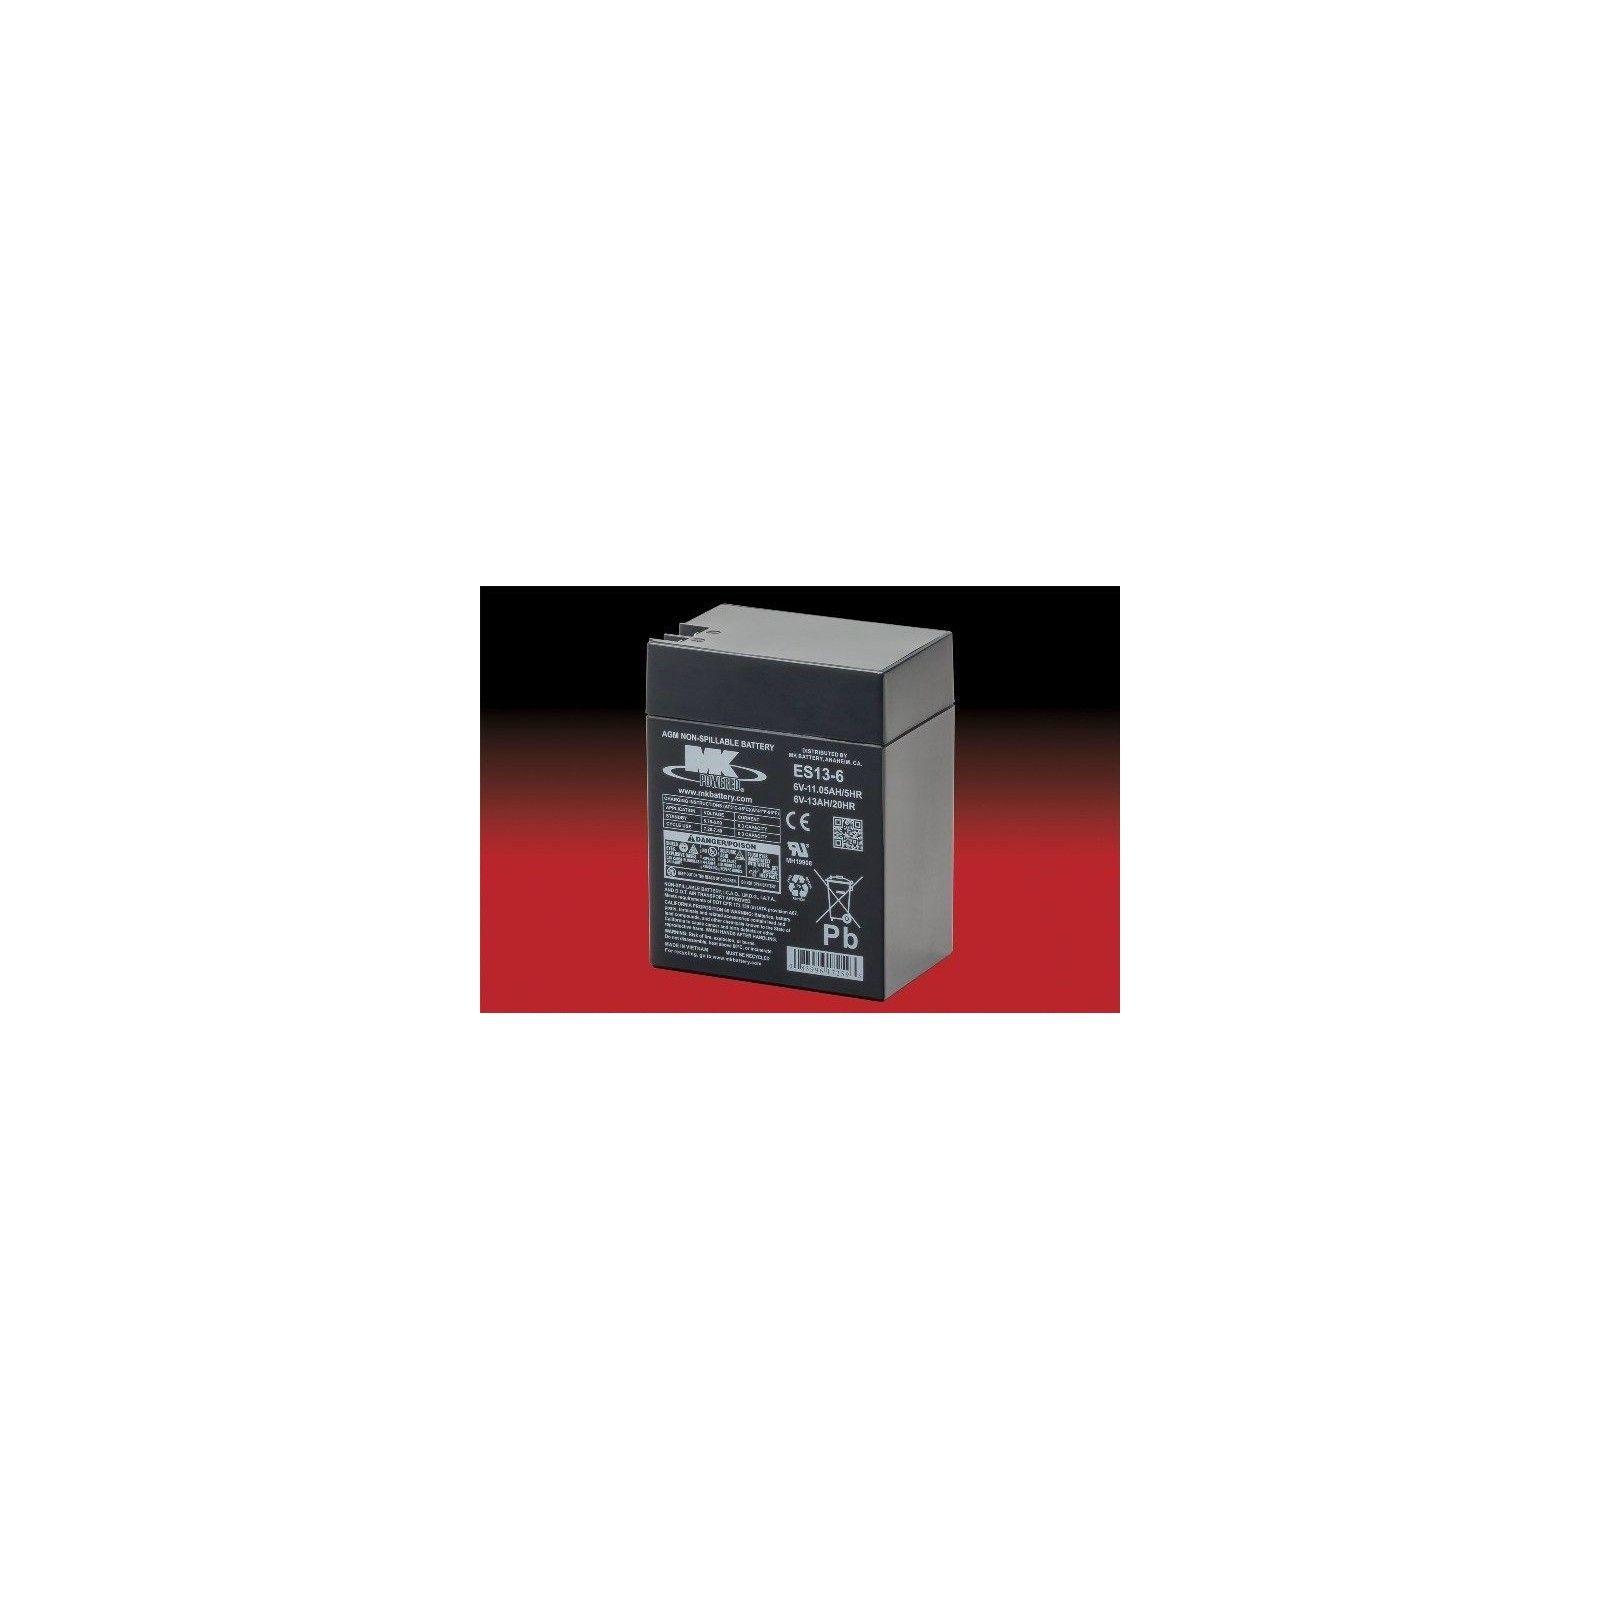 Batería MK ES13-6 13Ah 6V Agm MK - 1